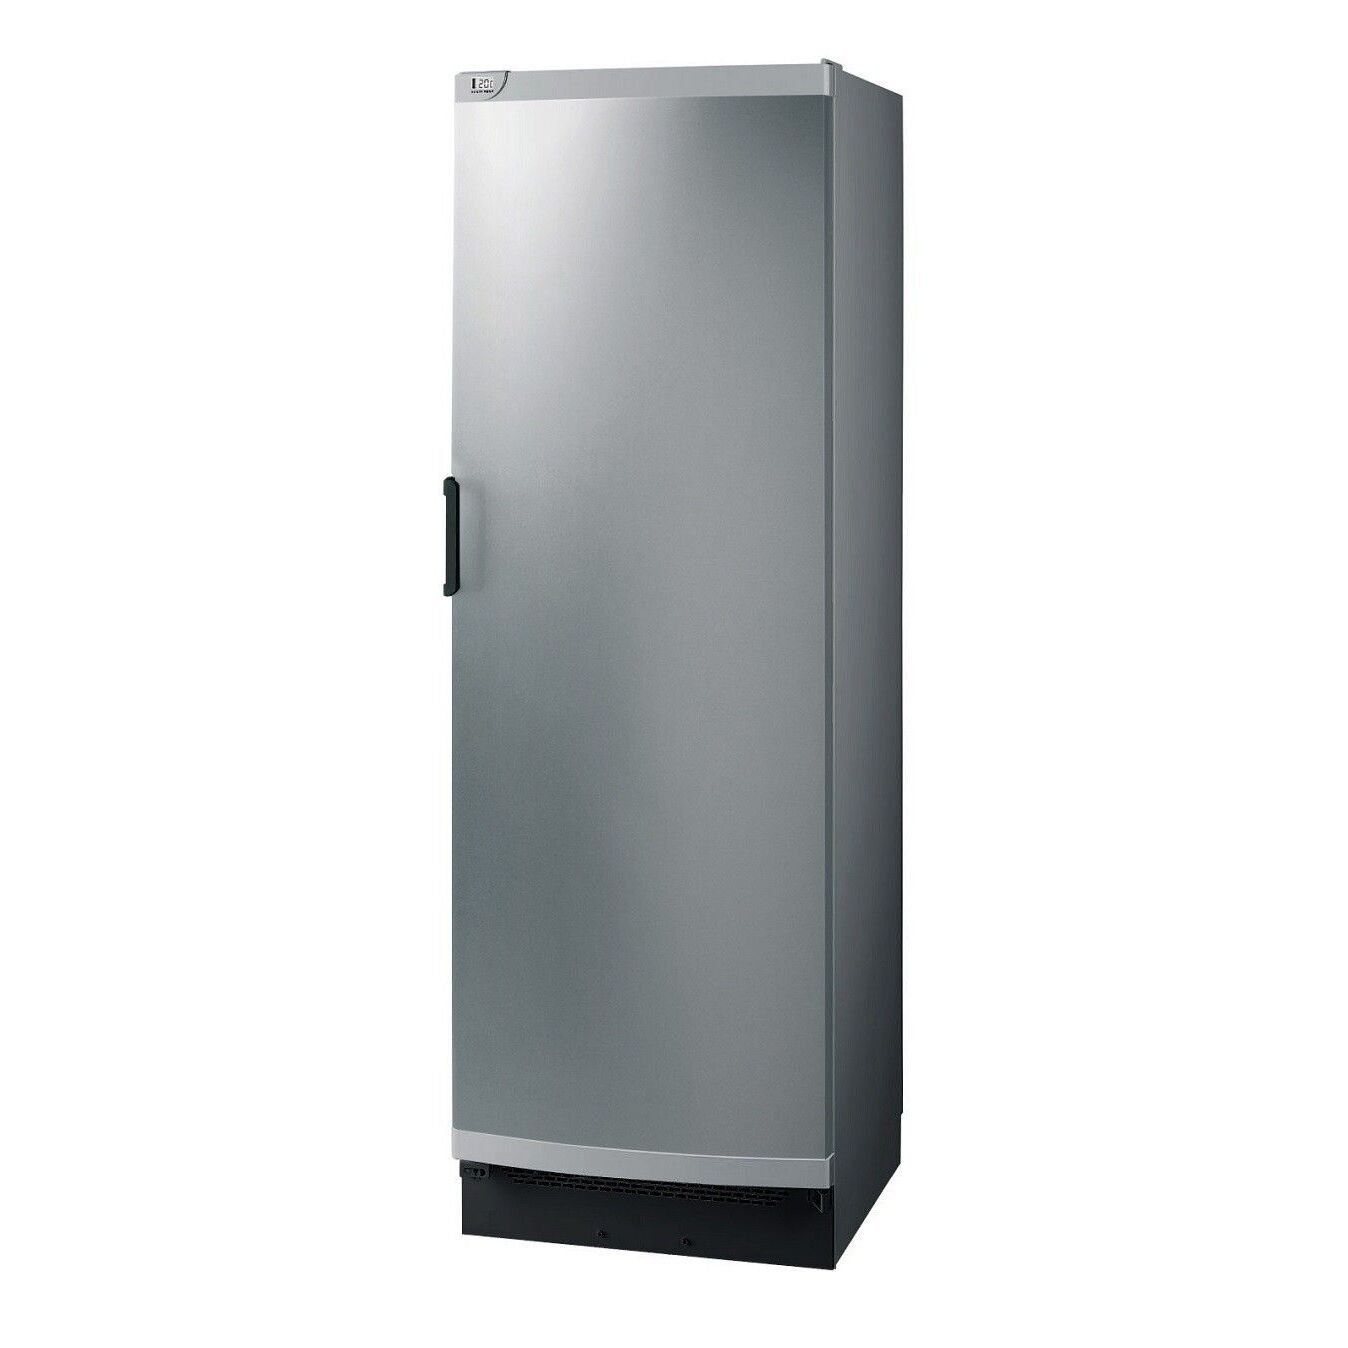 Vestfrost CFS344-STS Static Tall Freezer